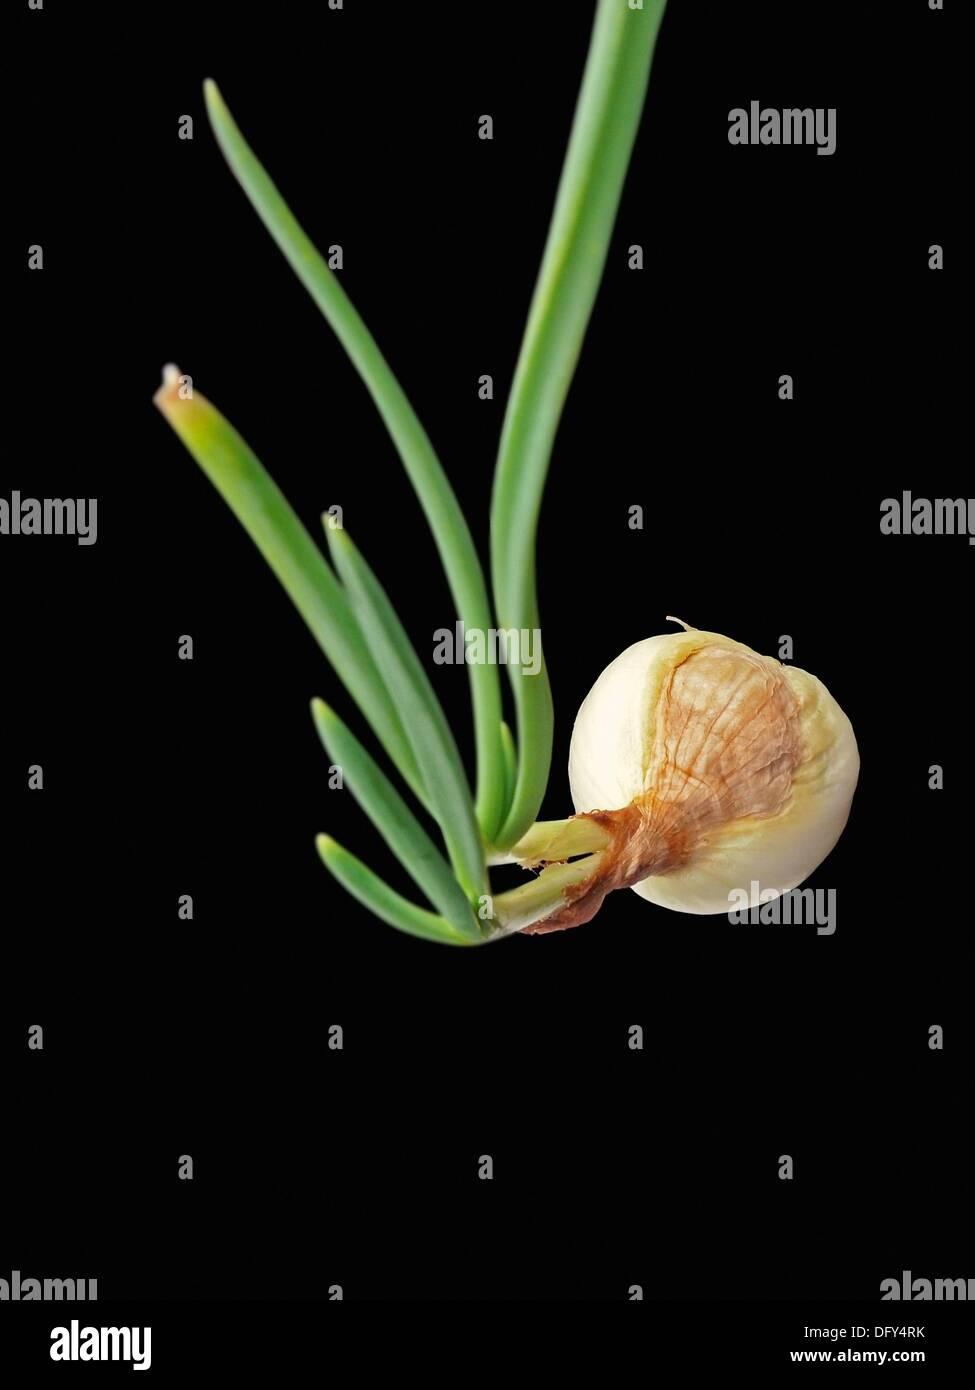 Onion leak, Allium cepa, Common vegetable - Stock Image